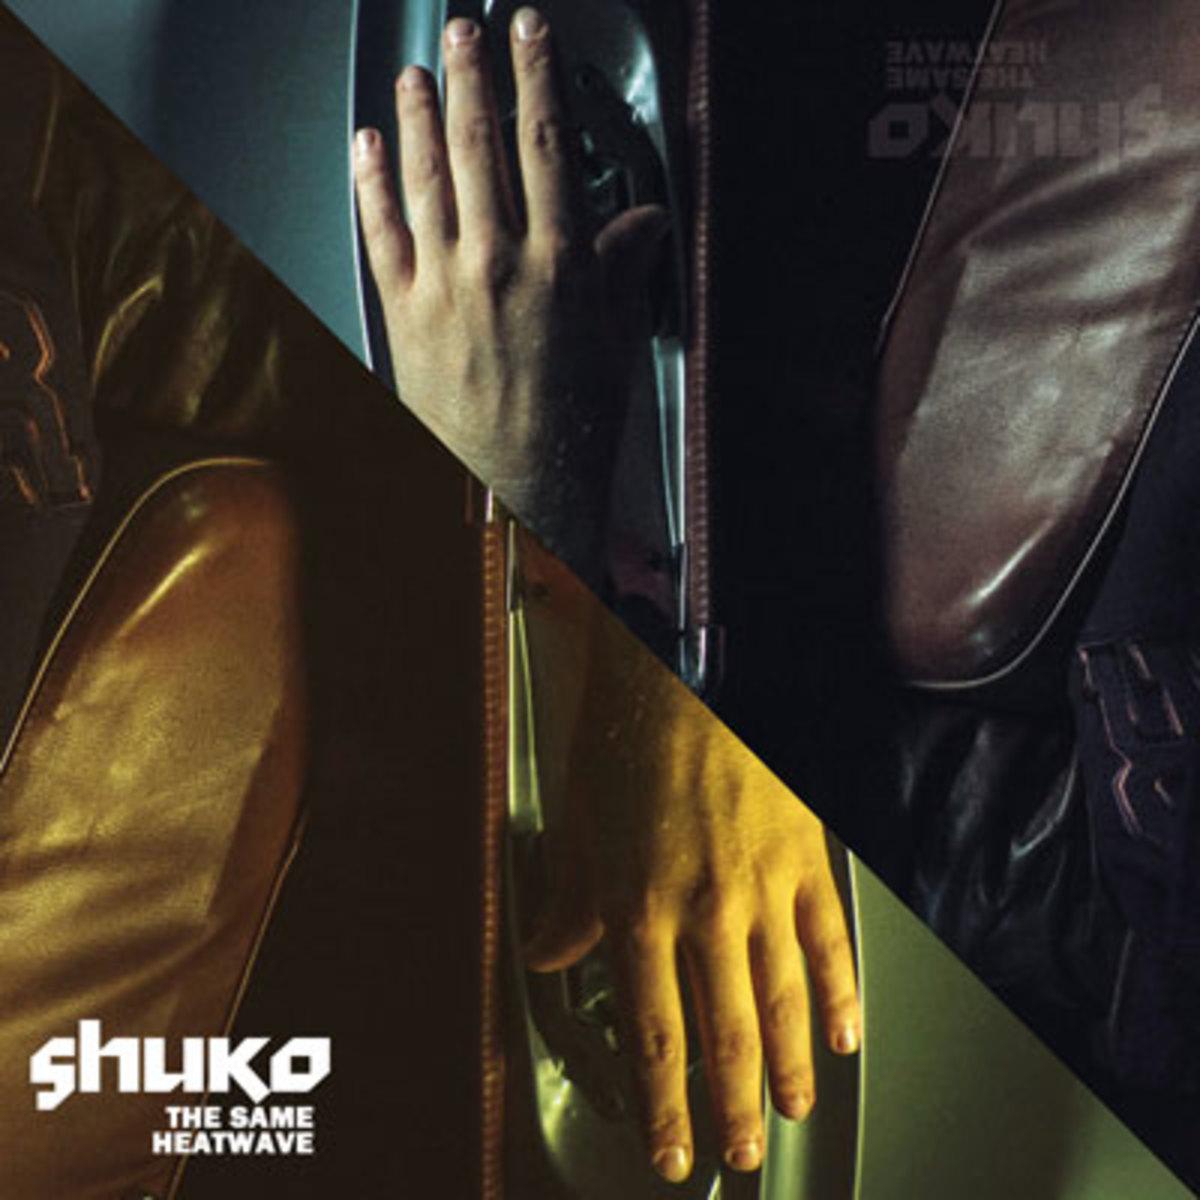 shuko-sameheatwave.jpg